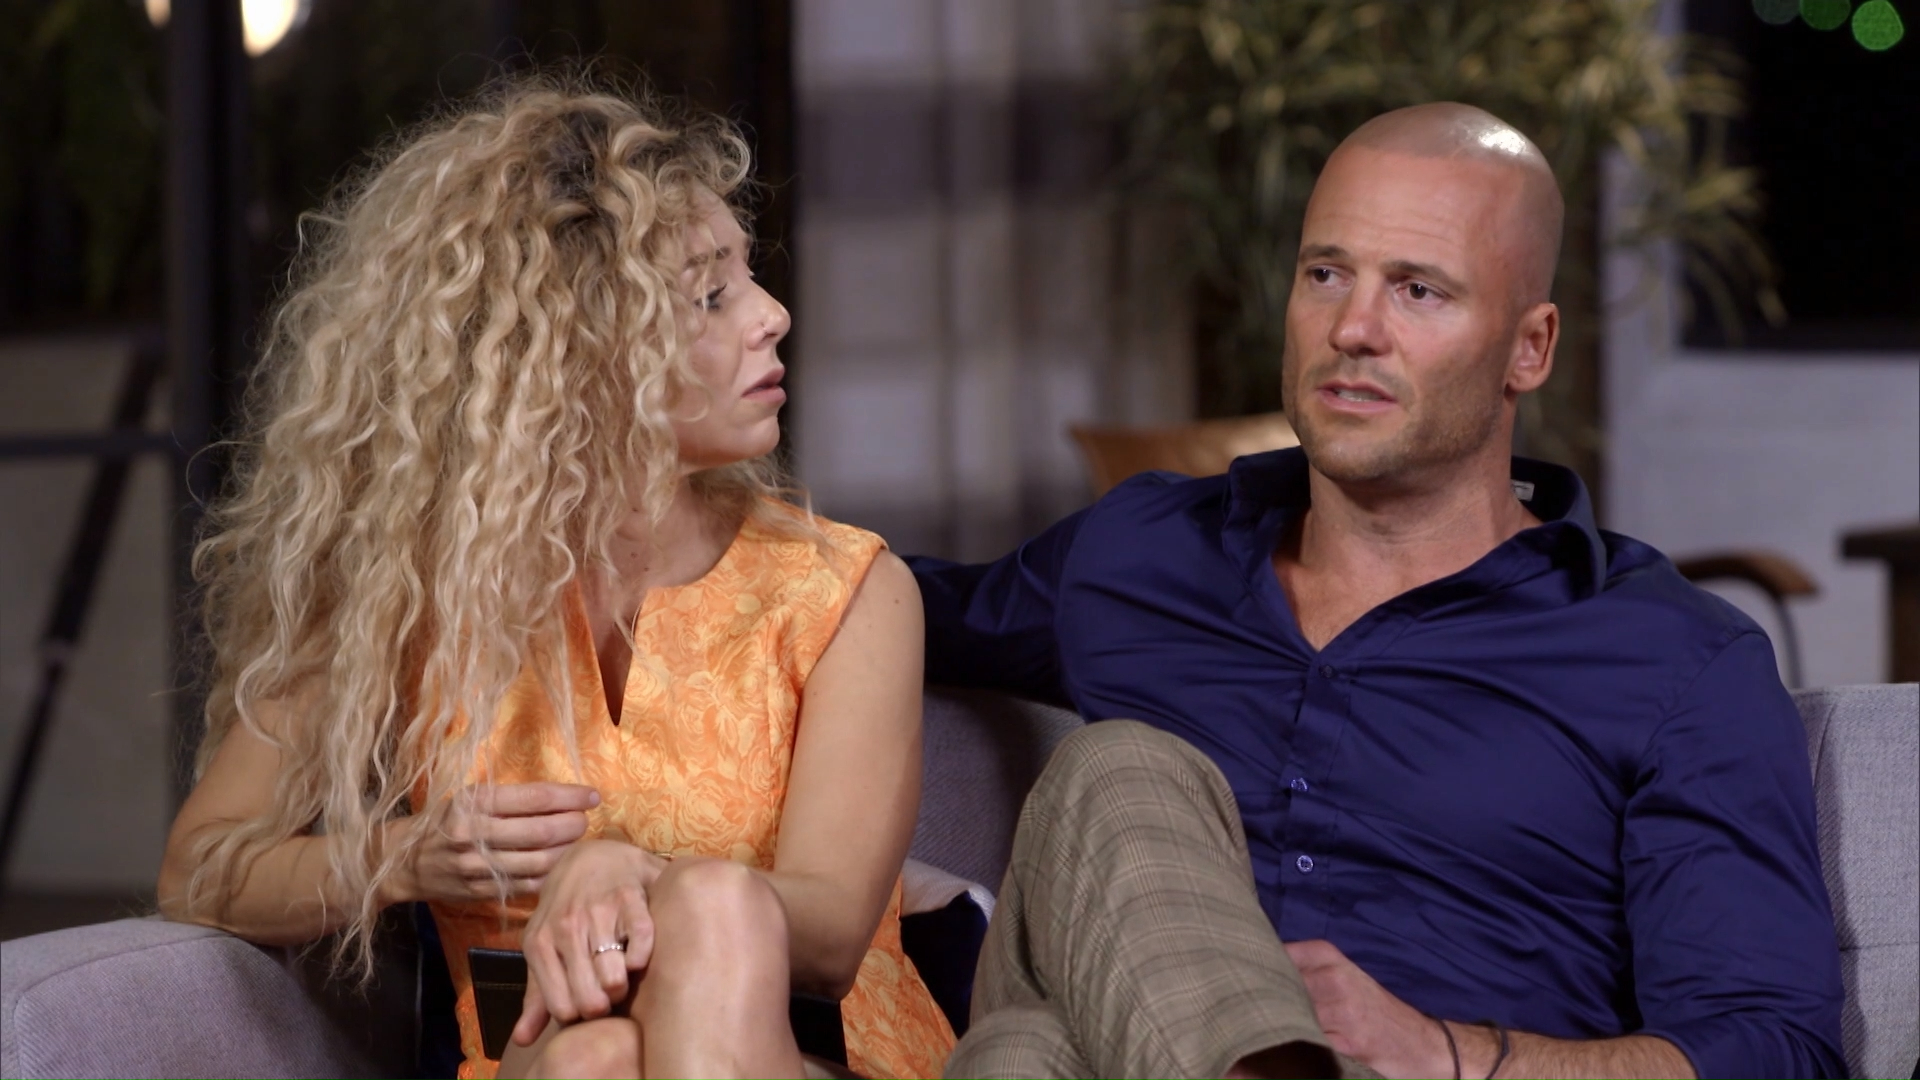 John thinks Heidi is sabotaging her relationship